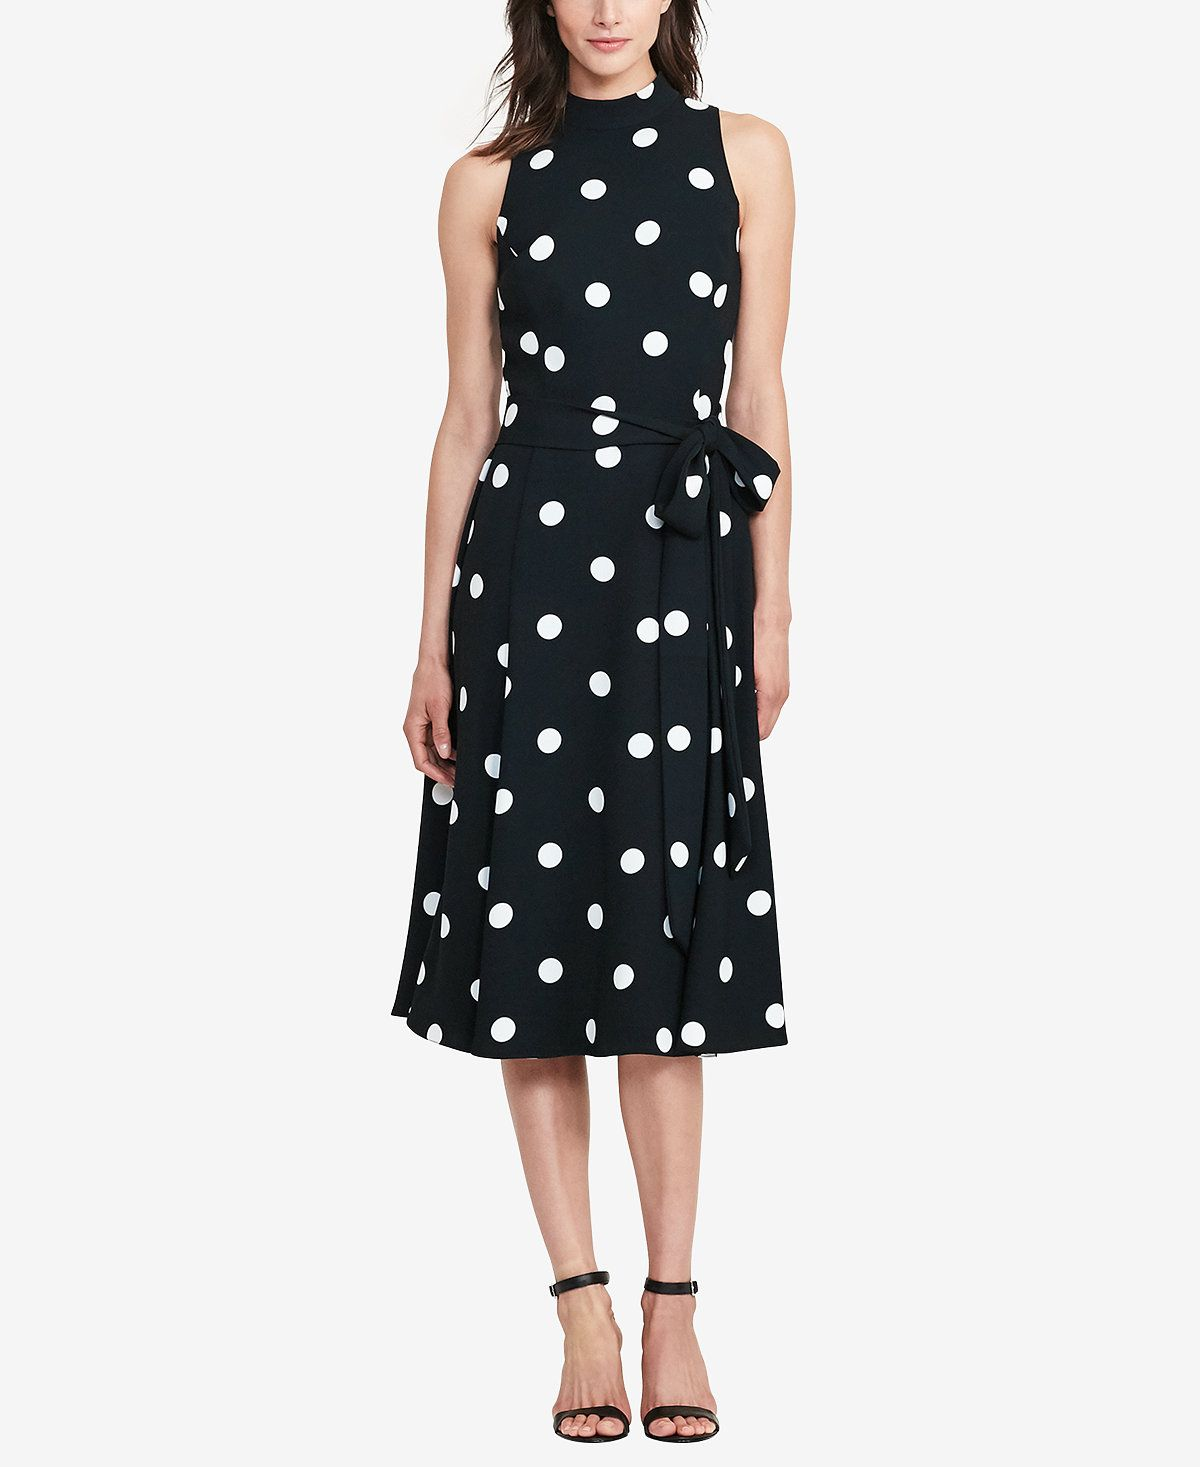 Lauren ralph lauren polkadot crepe dress dresses women macyus